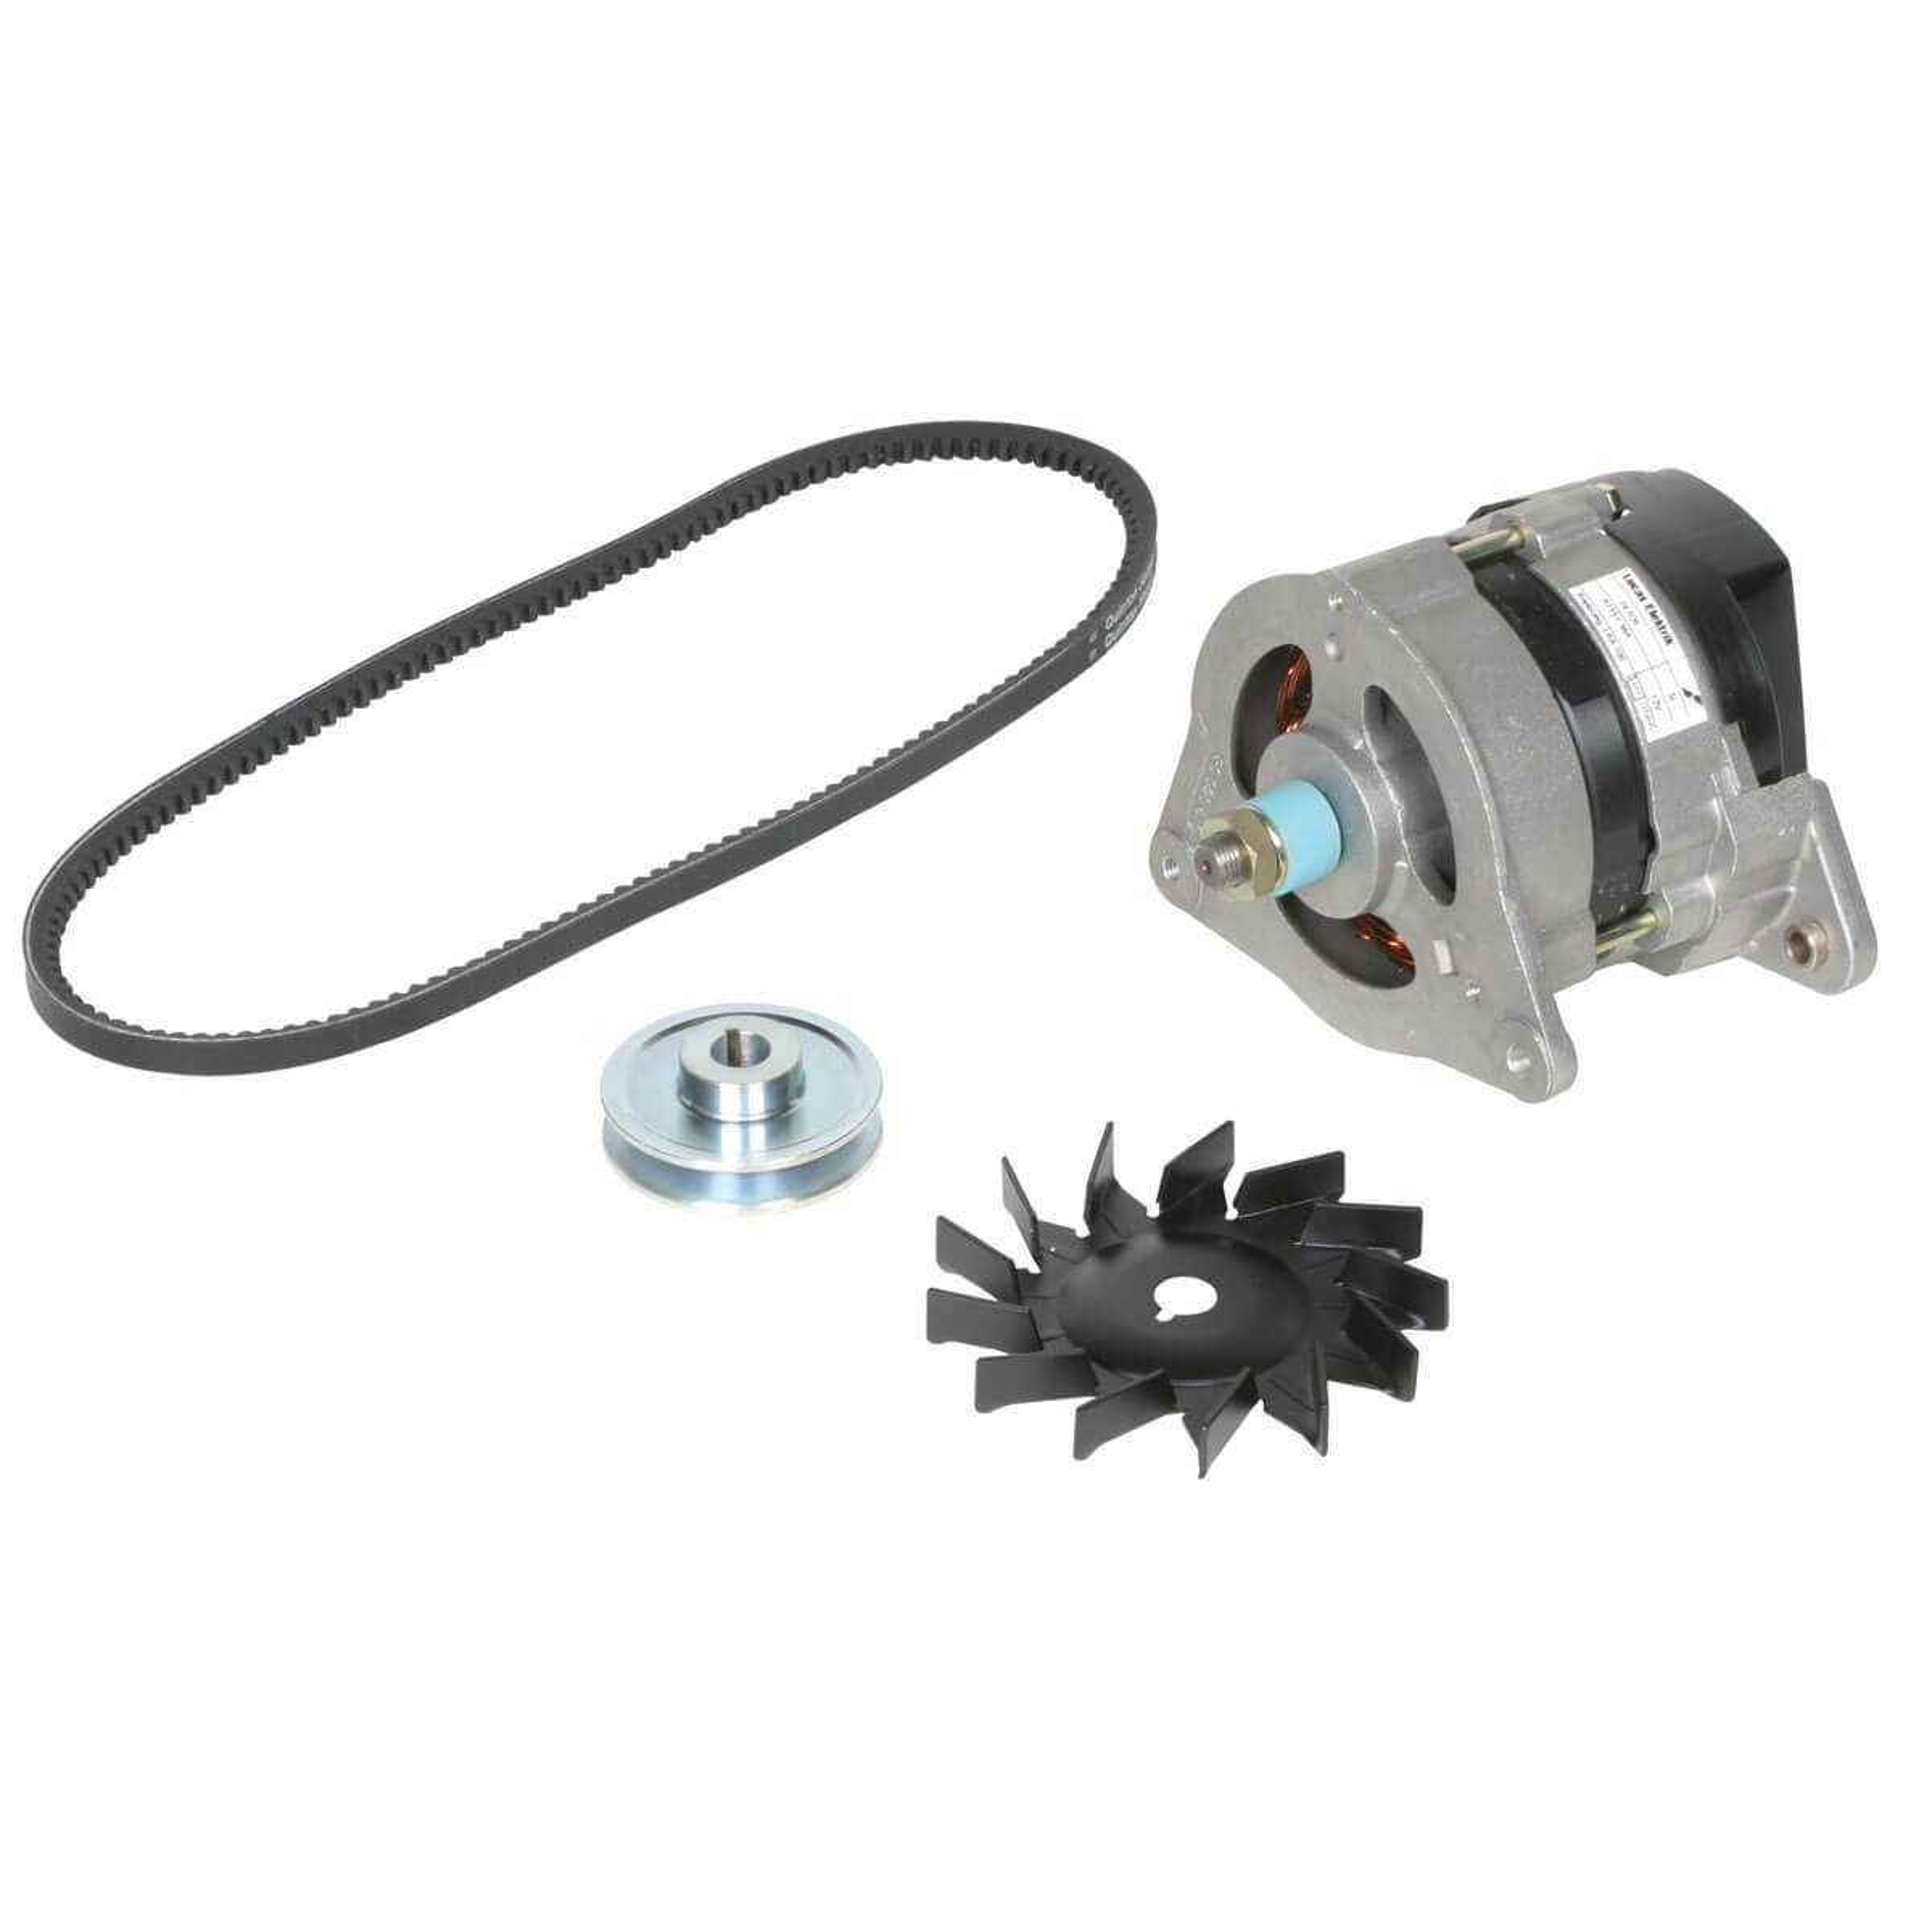 130 068 Alternator Conversion Kit Moss Motors